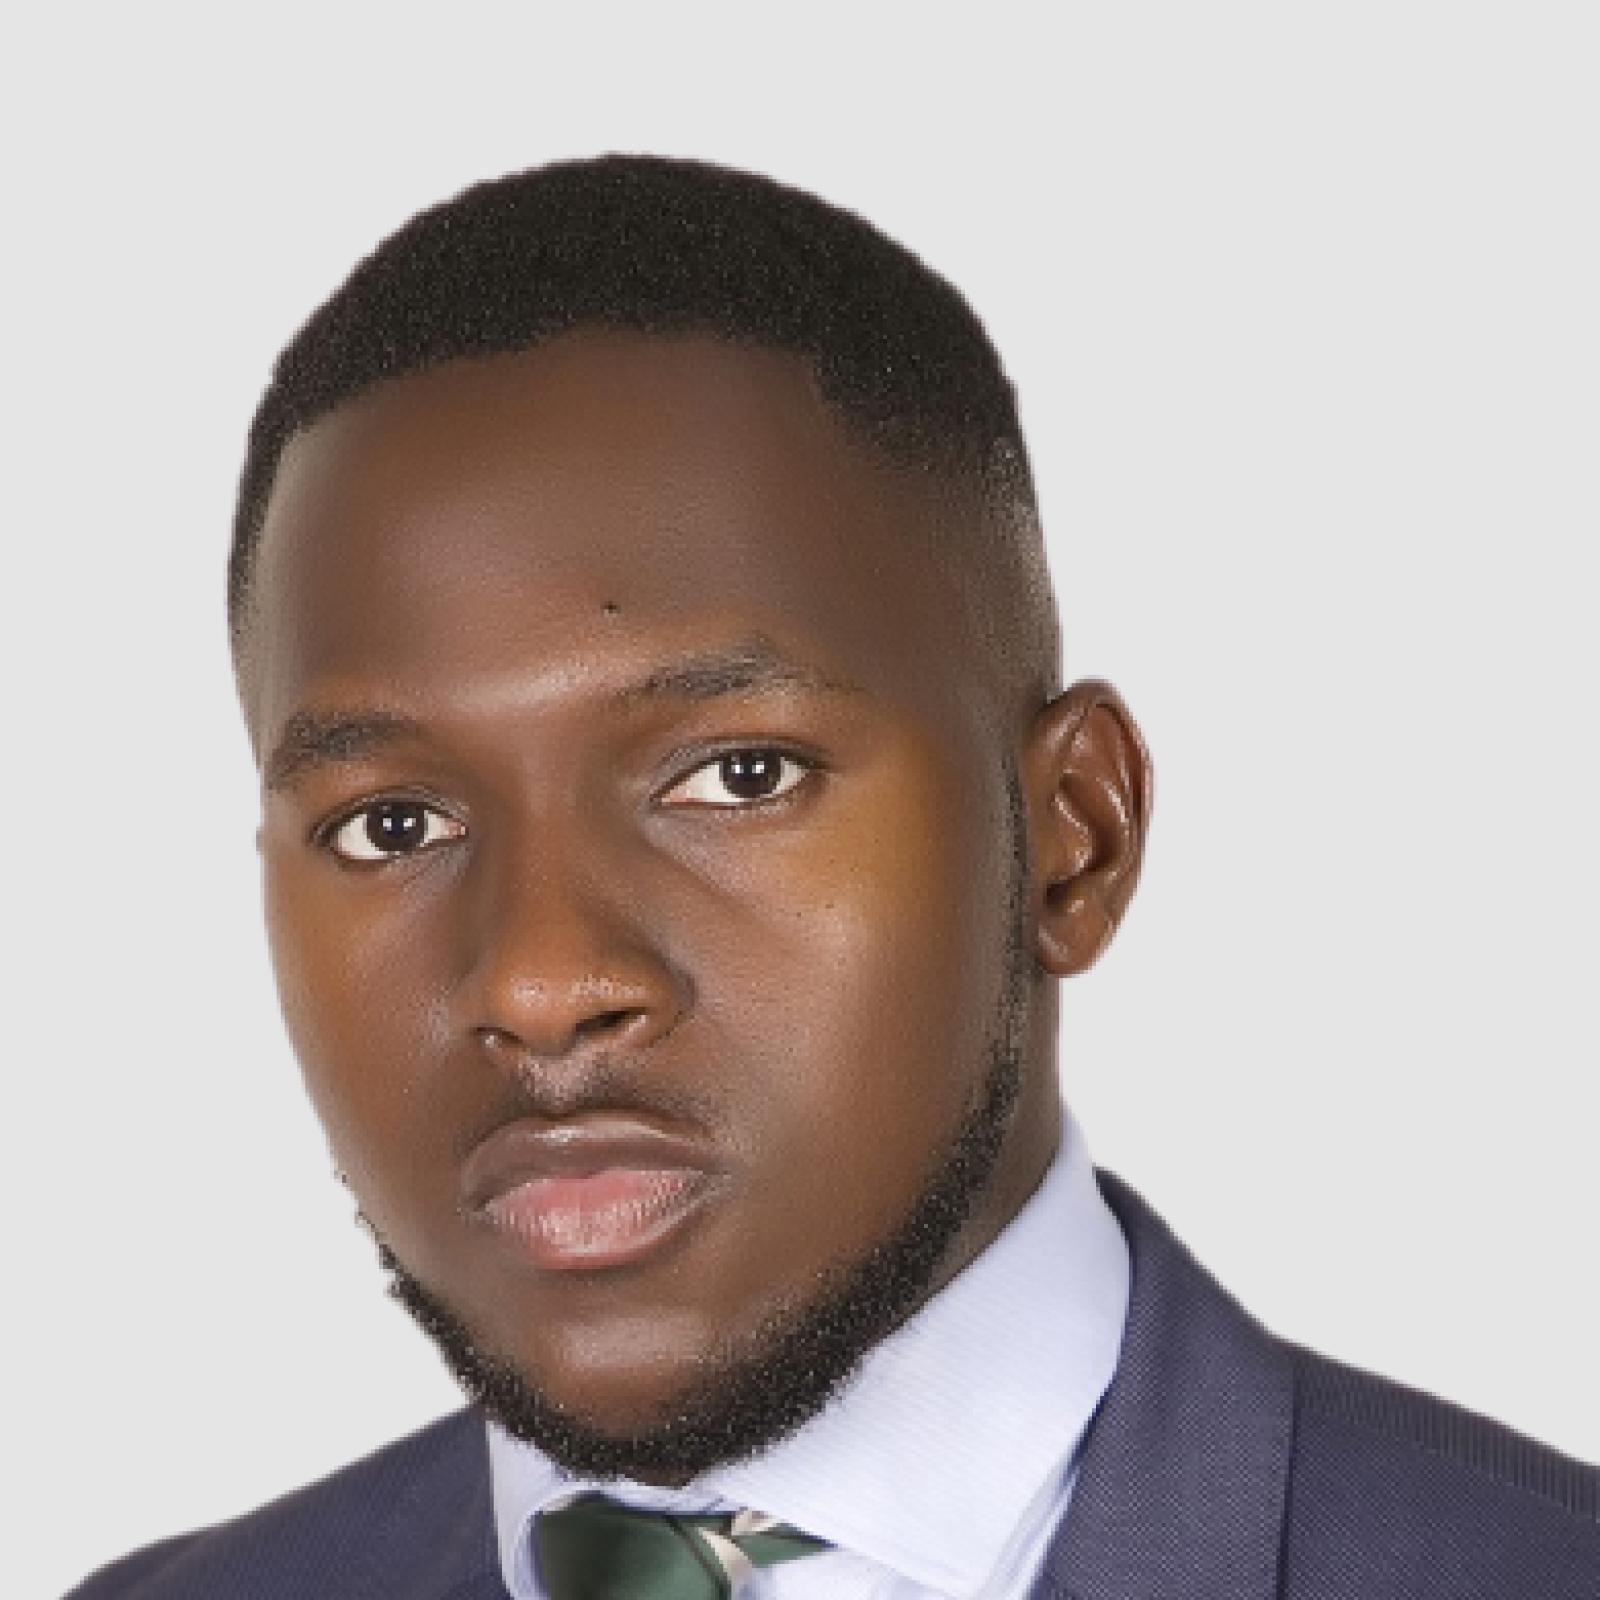 https://devafrique.com/wp-content/uploads/2021/07/Tosin-Kasali-Consultant-Nigeria-Greater-West-Africa-Ghana-Liberia-and-Sierra-Leone-2.jpg